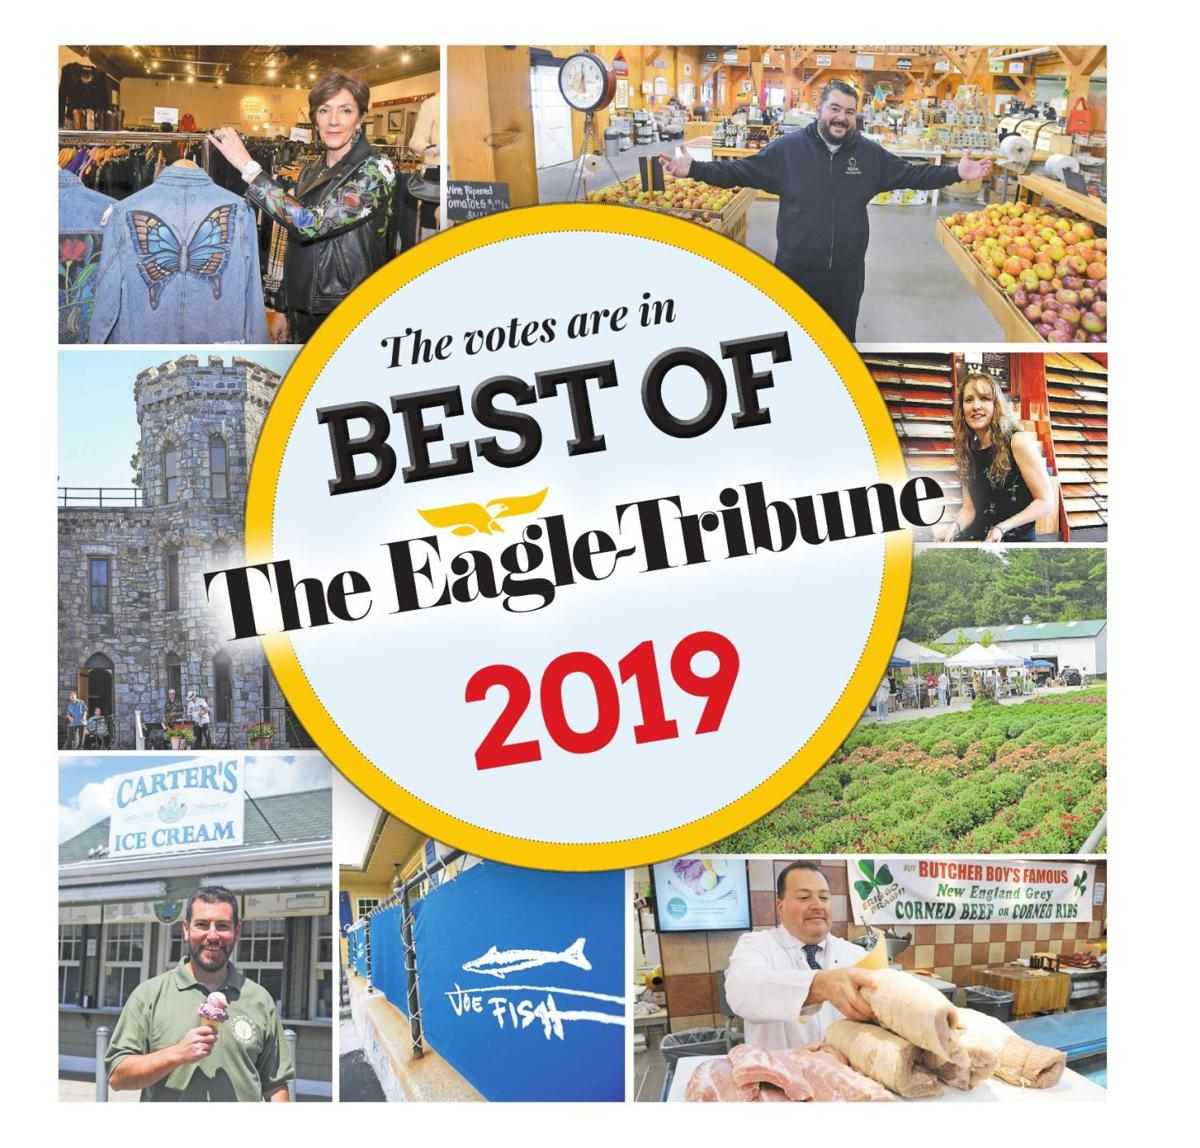 Best of The Eagle-Tribune 2019